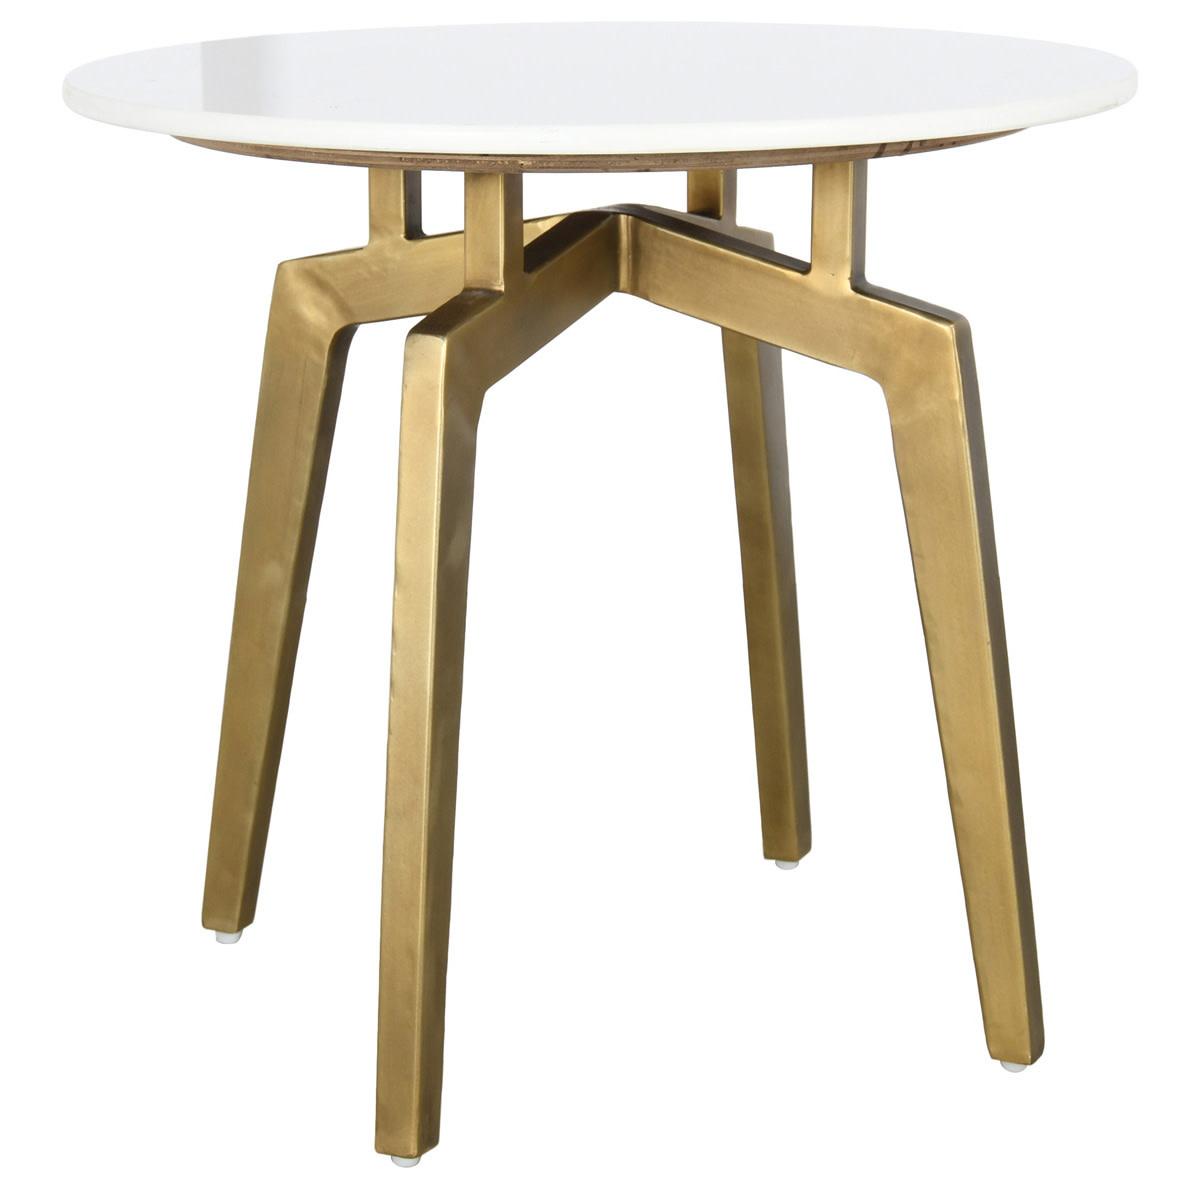 HESTON END TABLE